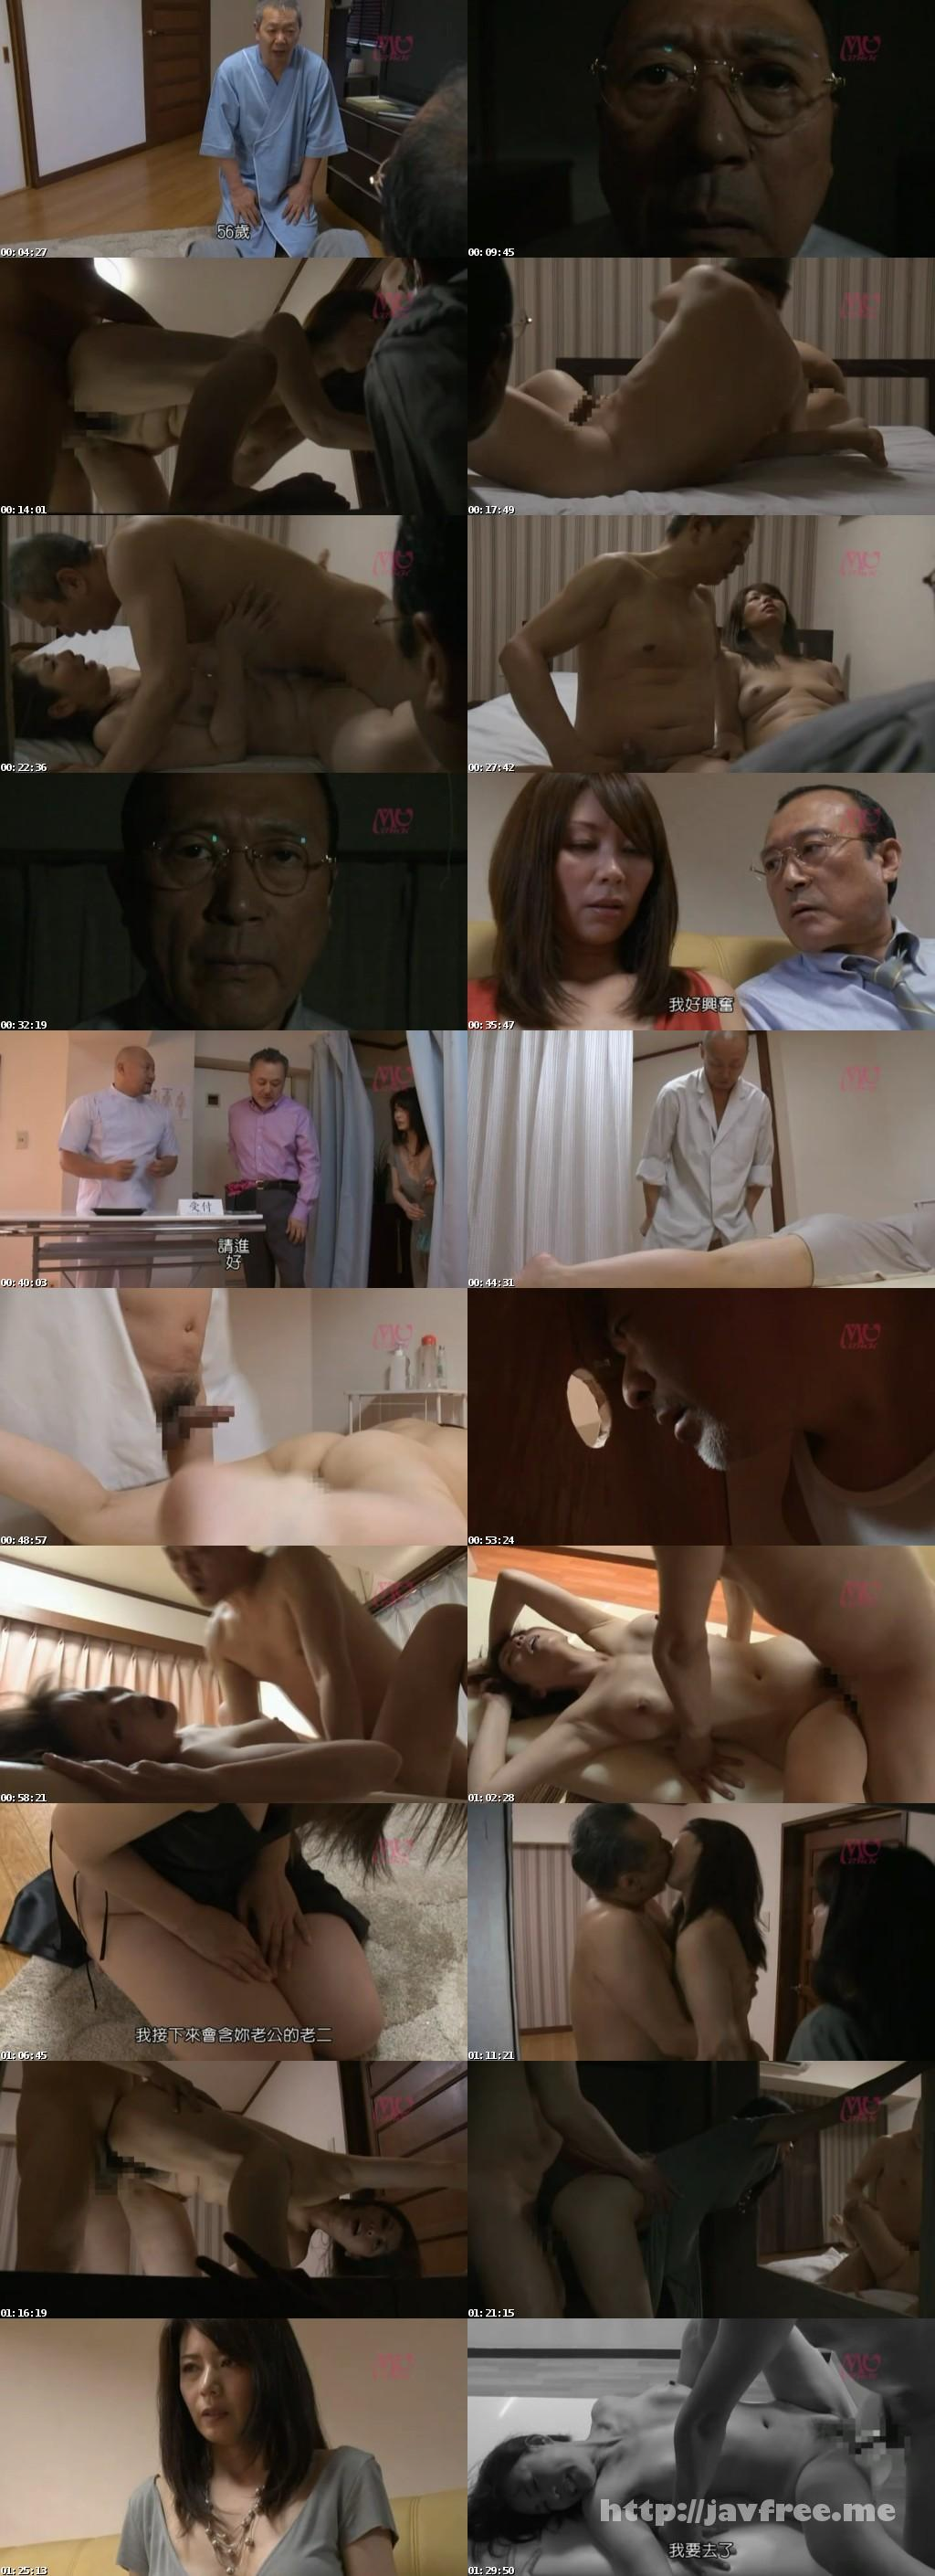 [HTMS-032] 夫婦交換のぞき 三浦恵理子 翔田千里 - image HTMS-032 on https://javfree.me